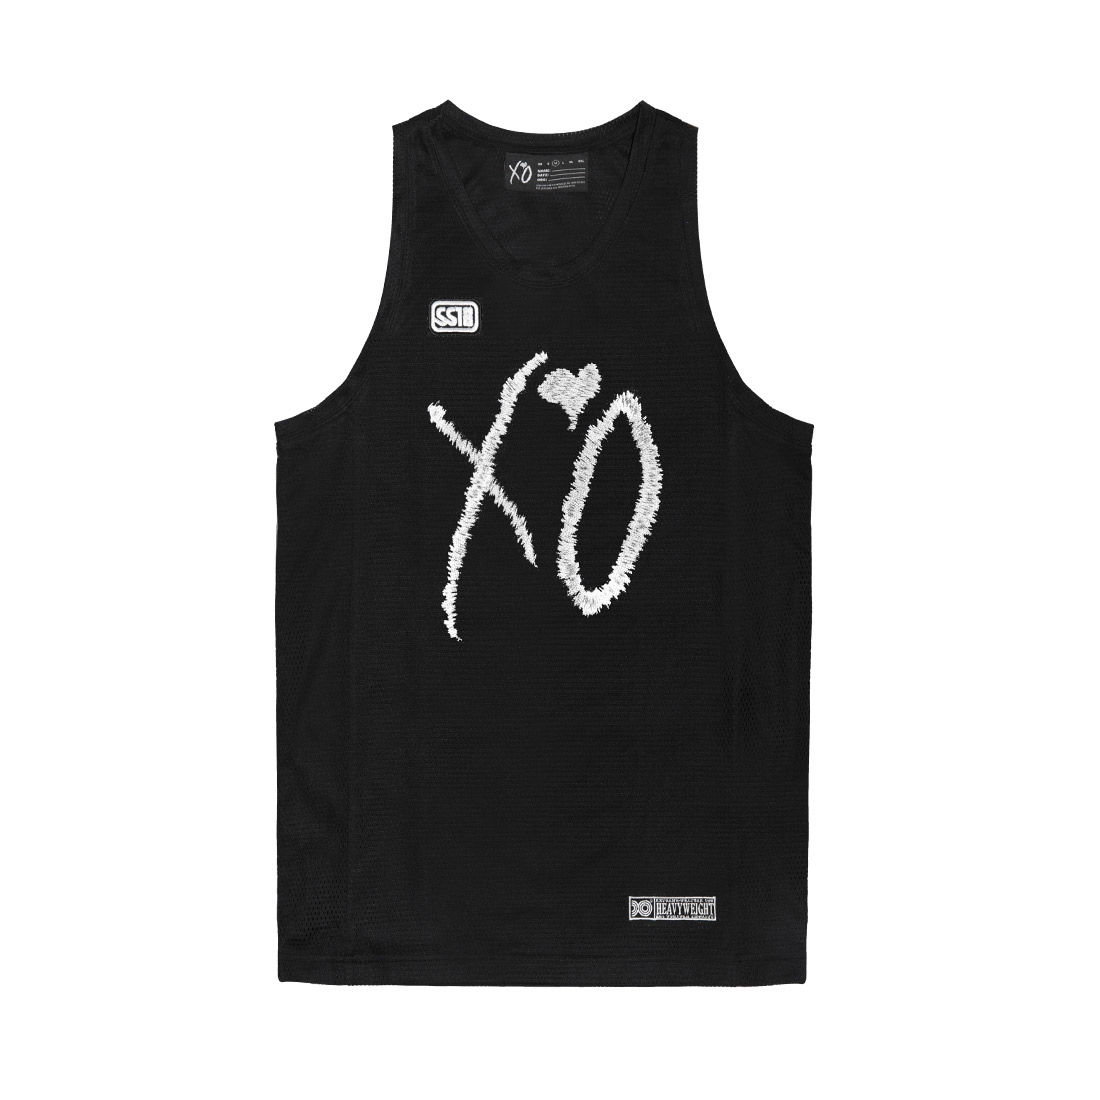 The Weeknd: XO CLASSIC LOGO MESH SPORT JERSEY - S